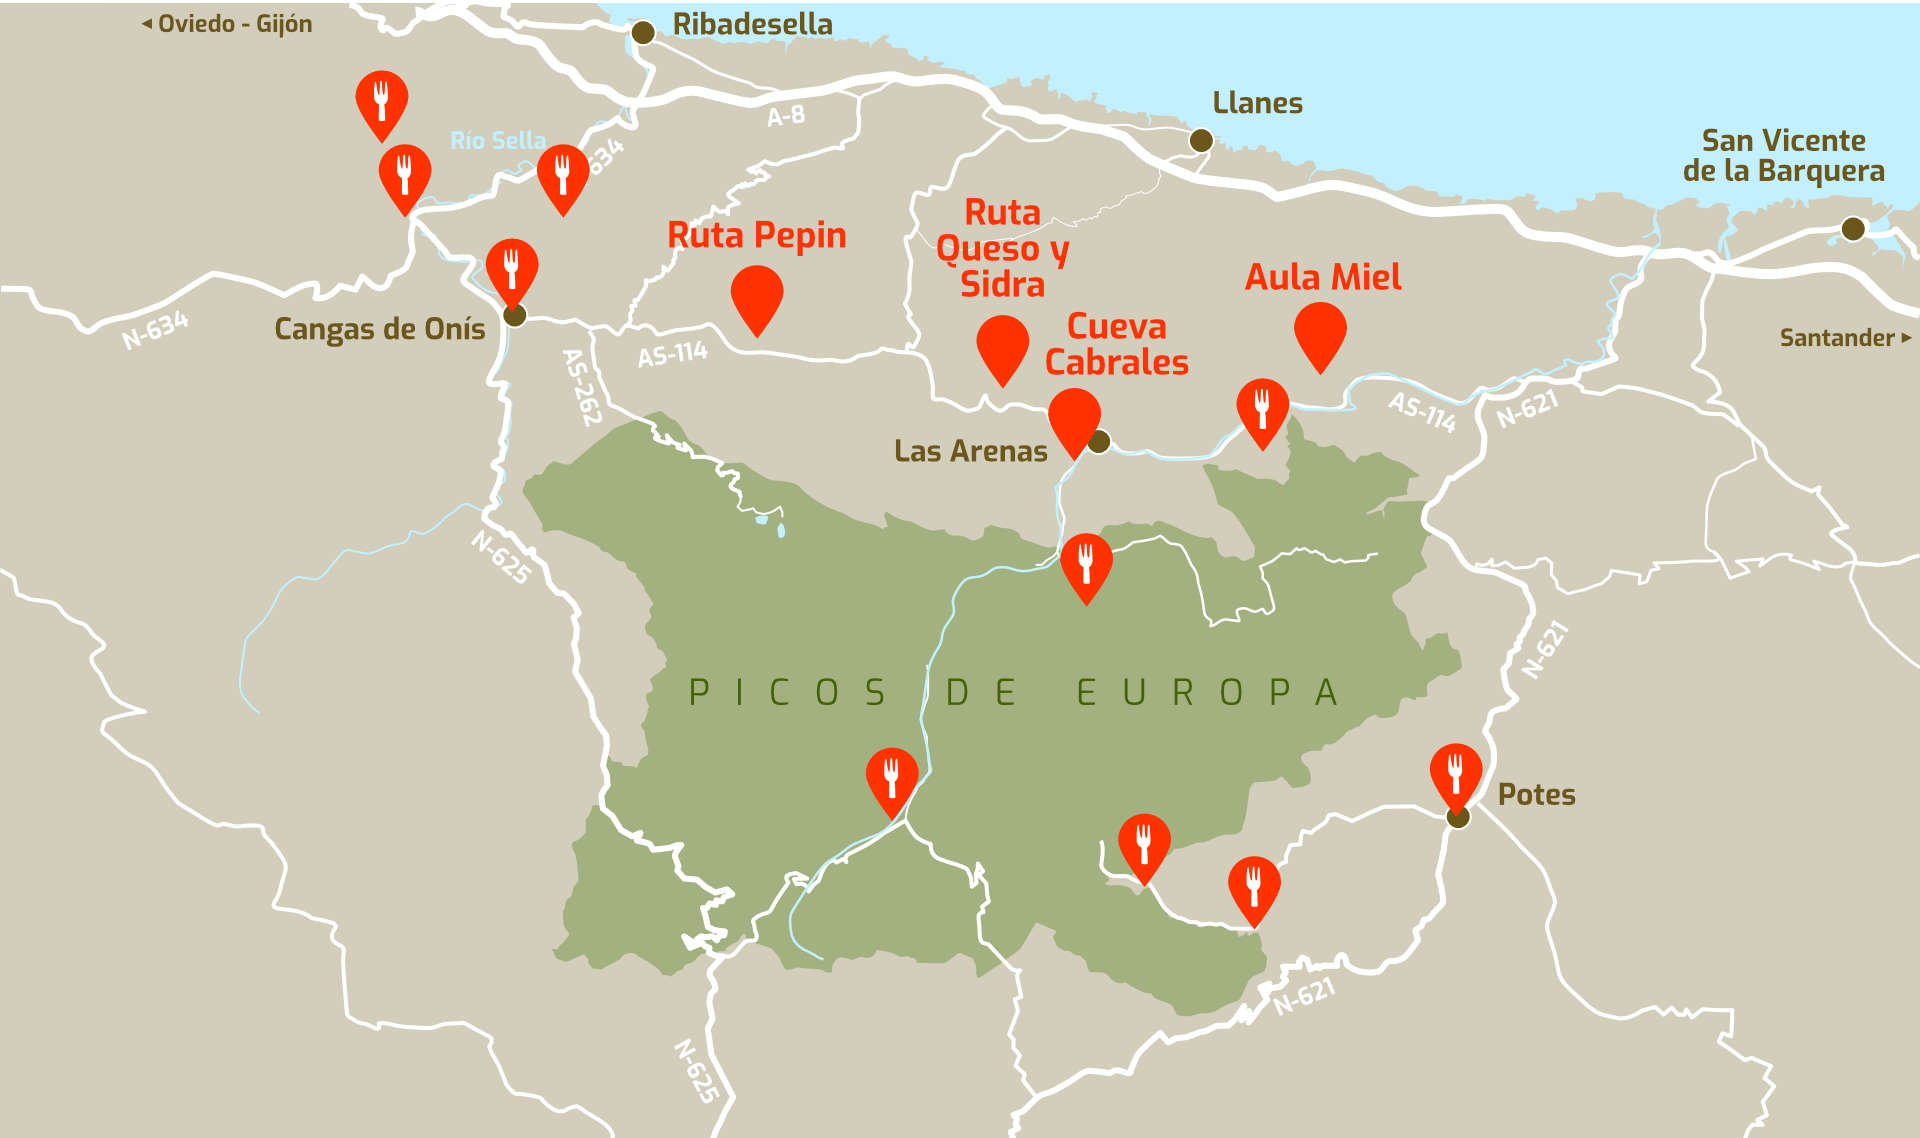 Mapa rutas gastronómicas en Picos de Europa